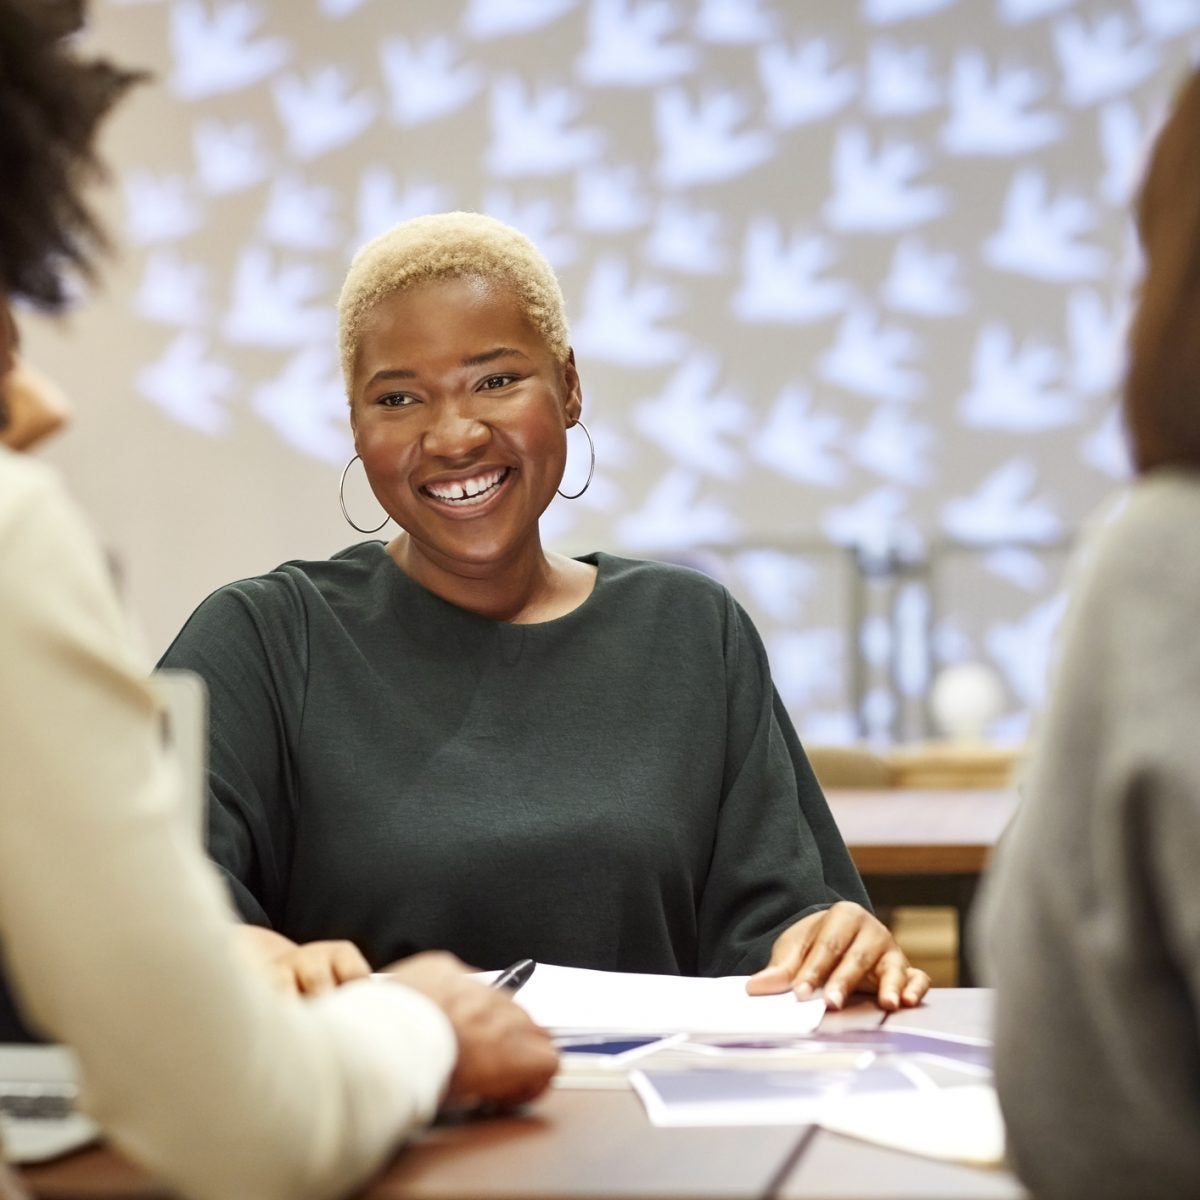 Loop Capital, Goldman Sachs and Google Launch Cash Management Solution to Help Close Racial Wealth Gap